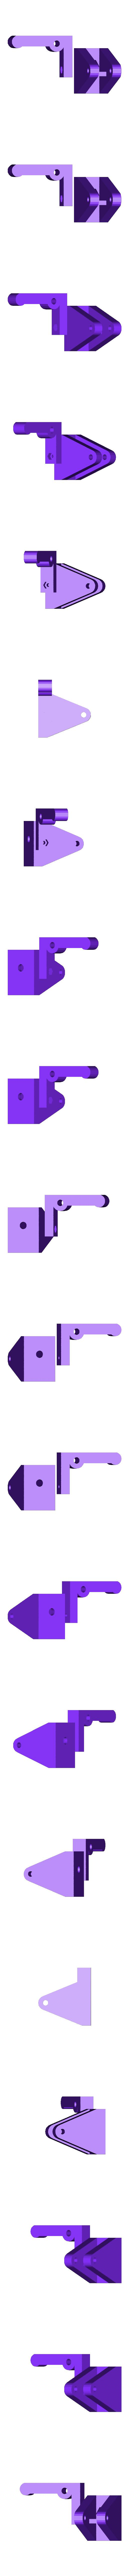 morsa_per_cnc.stl Download free STL file locking pieces for CNC plans • 3D print design, Porelynlas